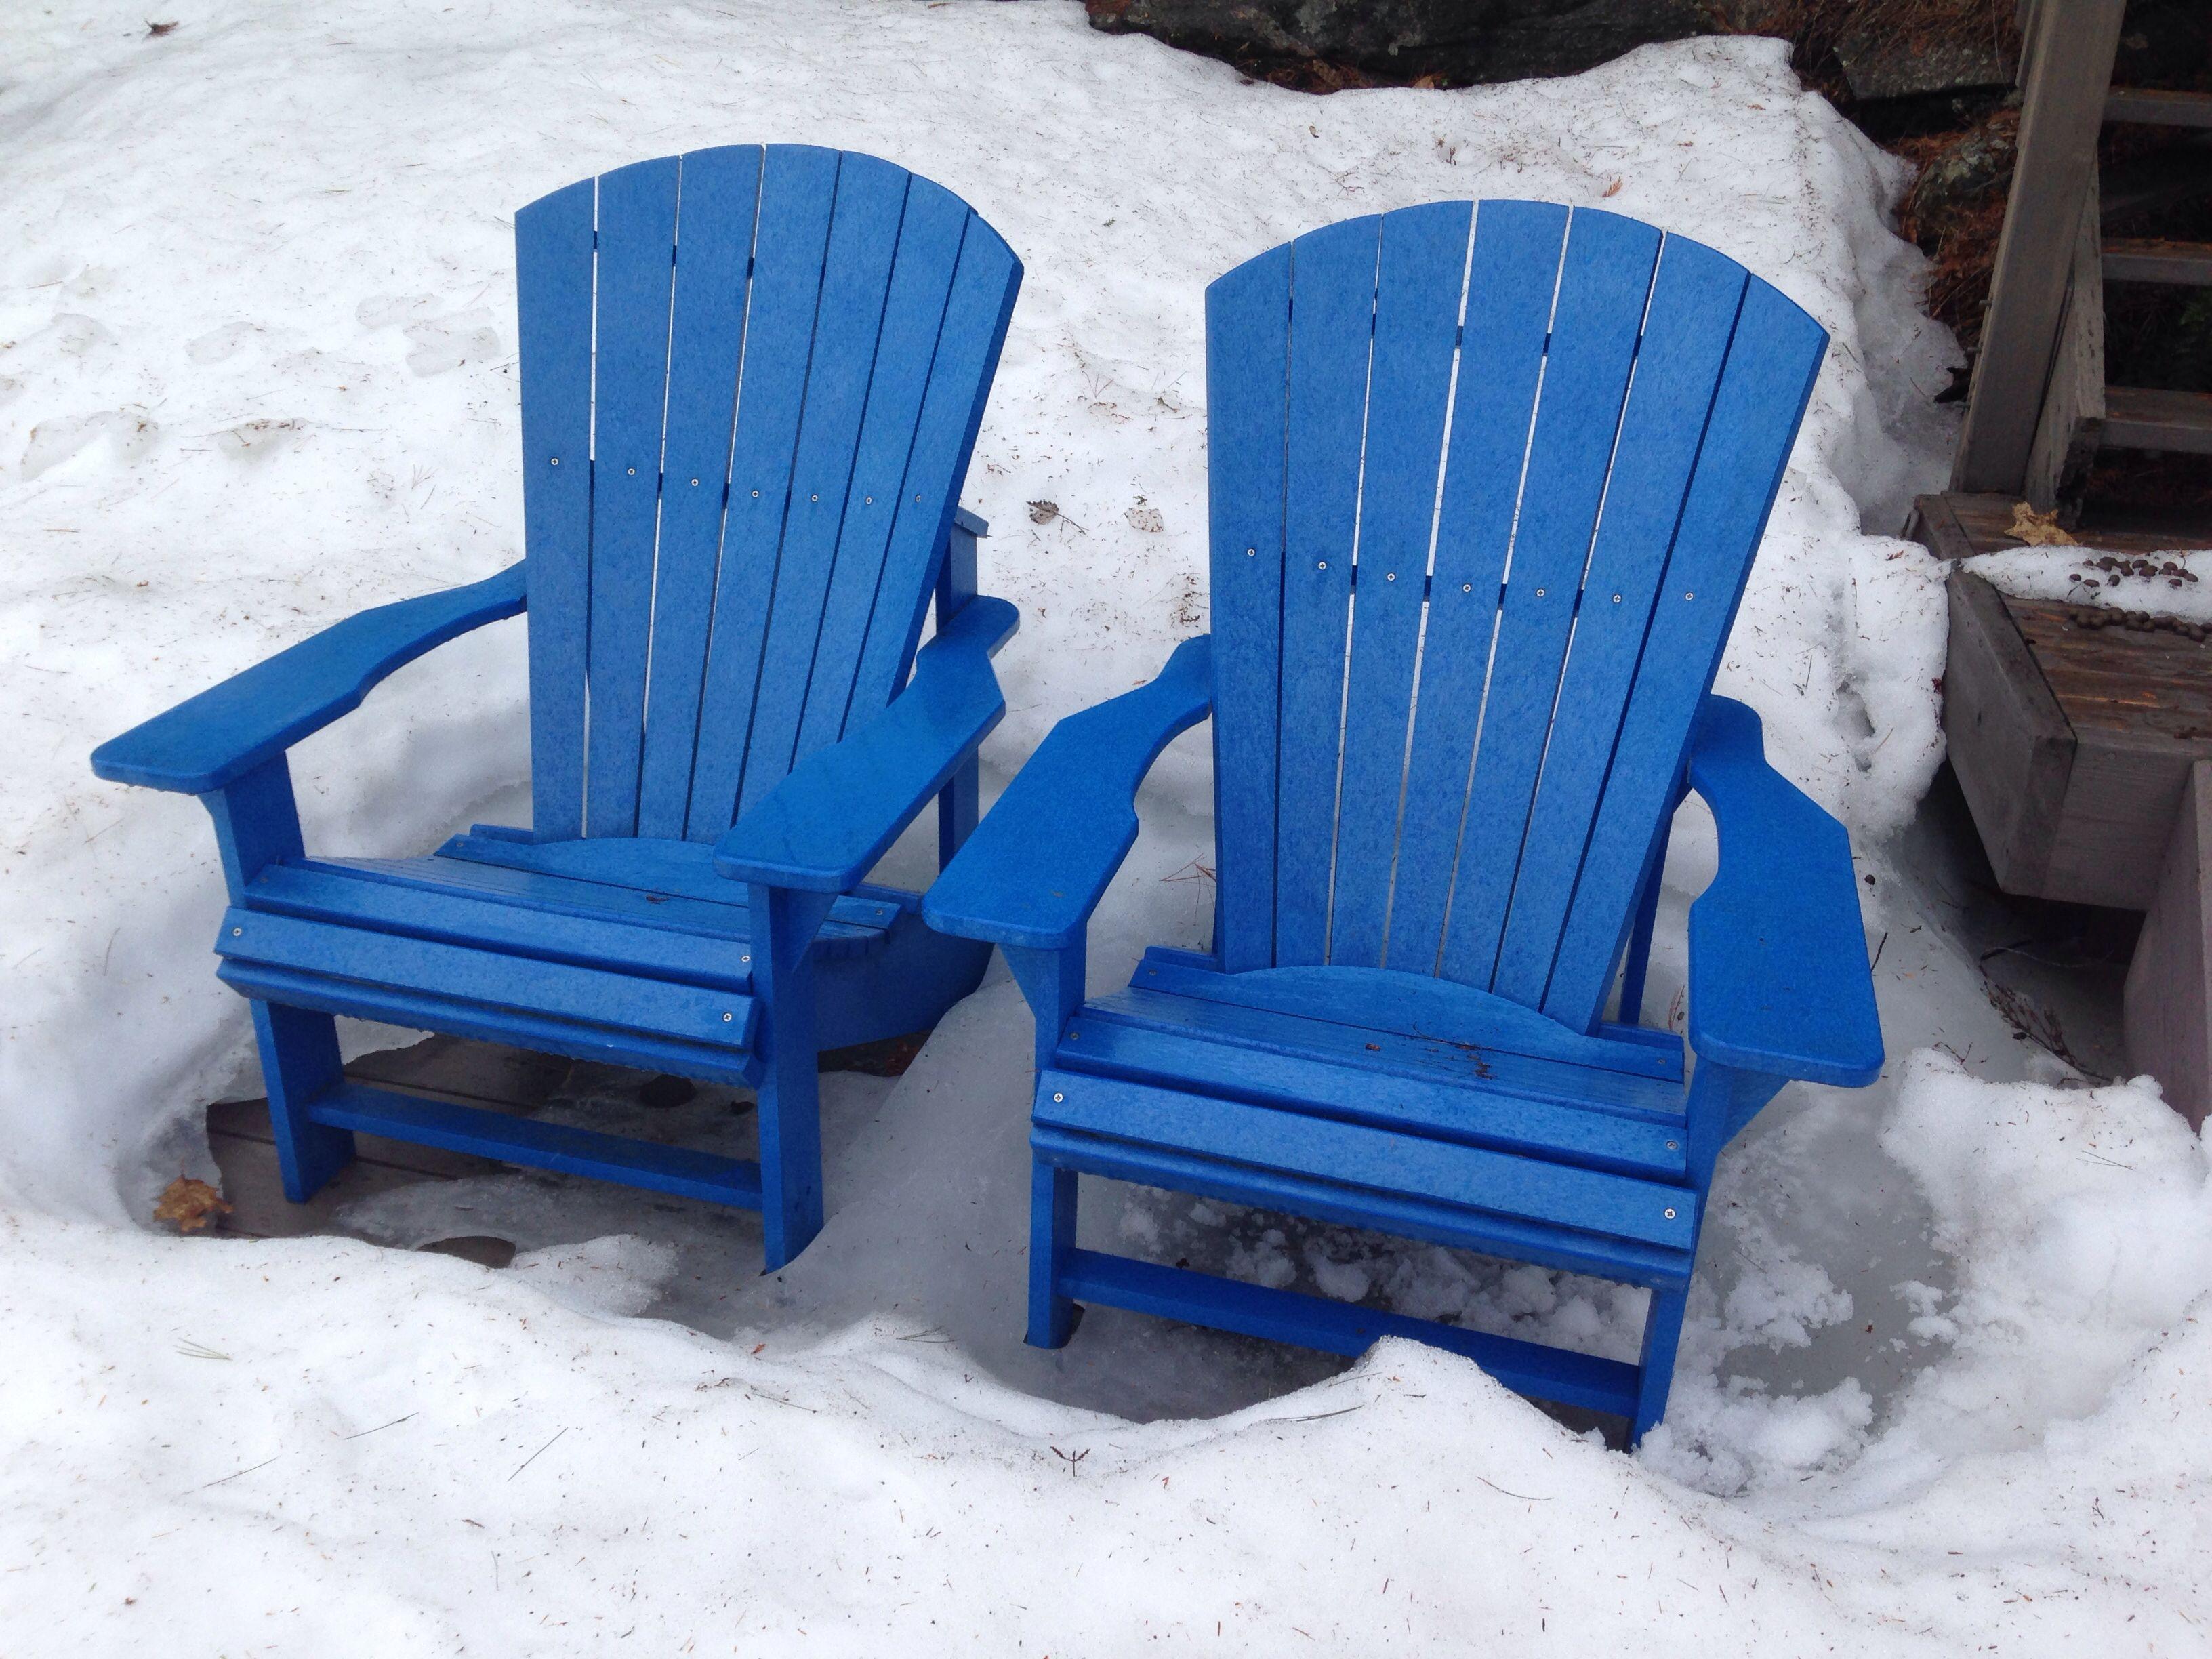 Muskoka chairs in the snow.